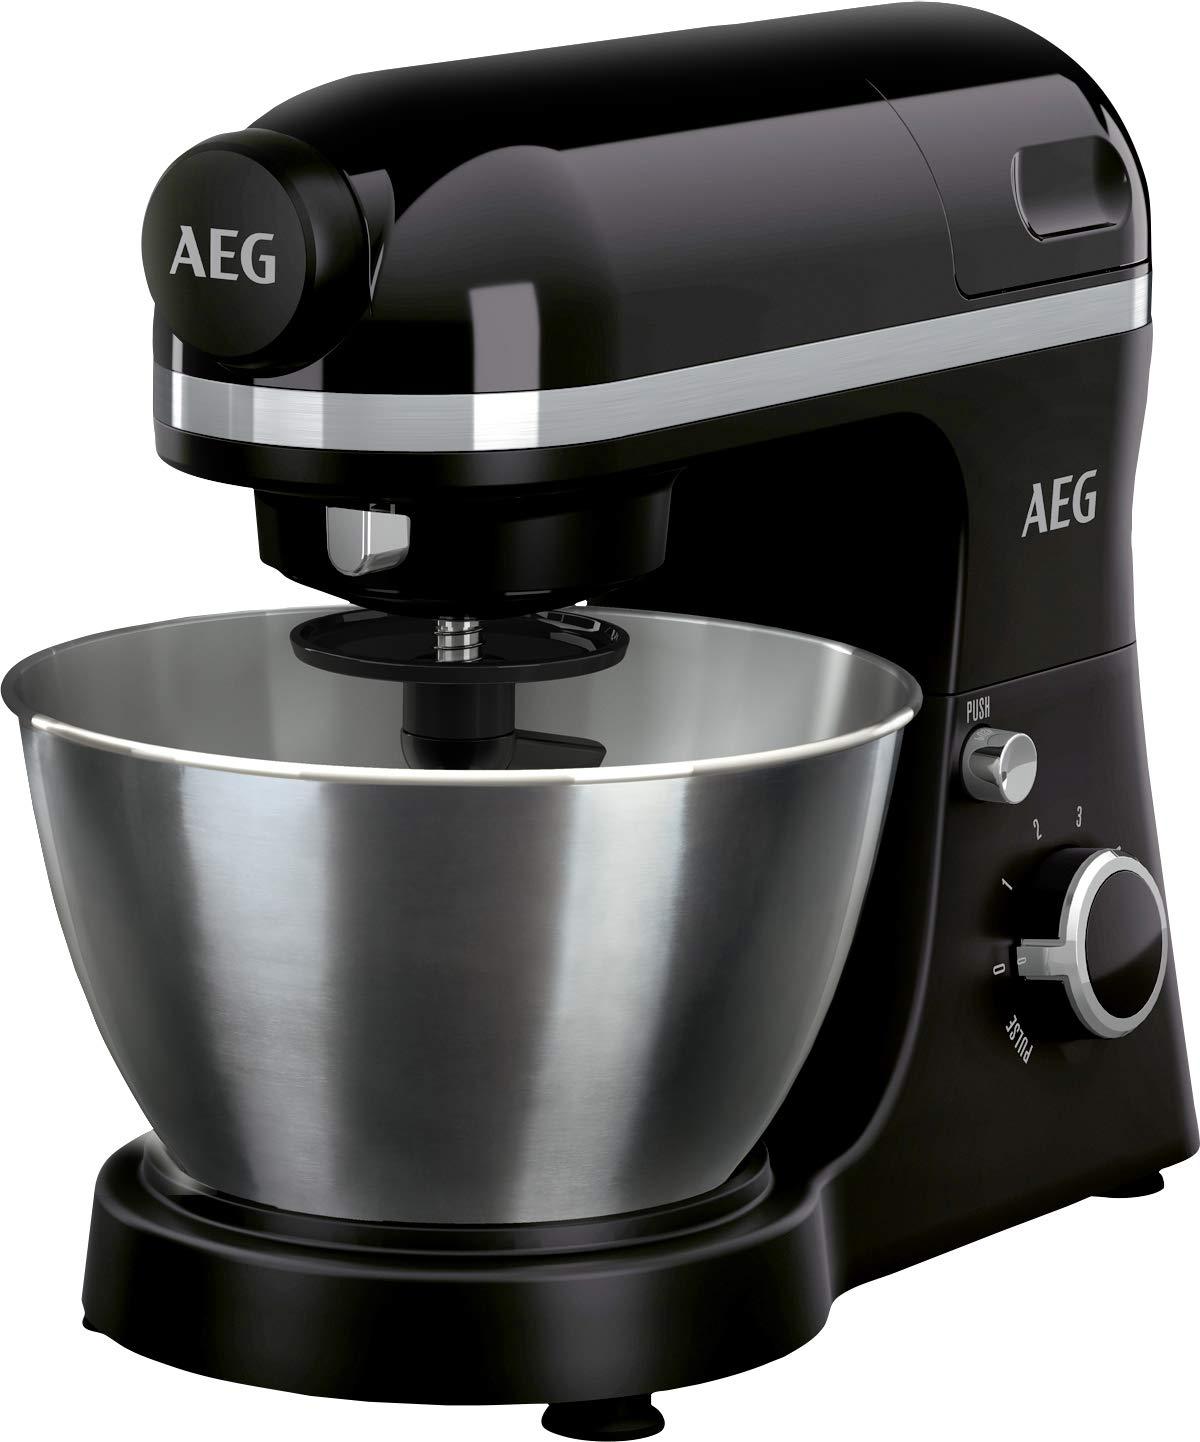 AEG KM 3300 Test